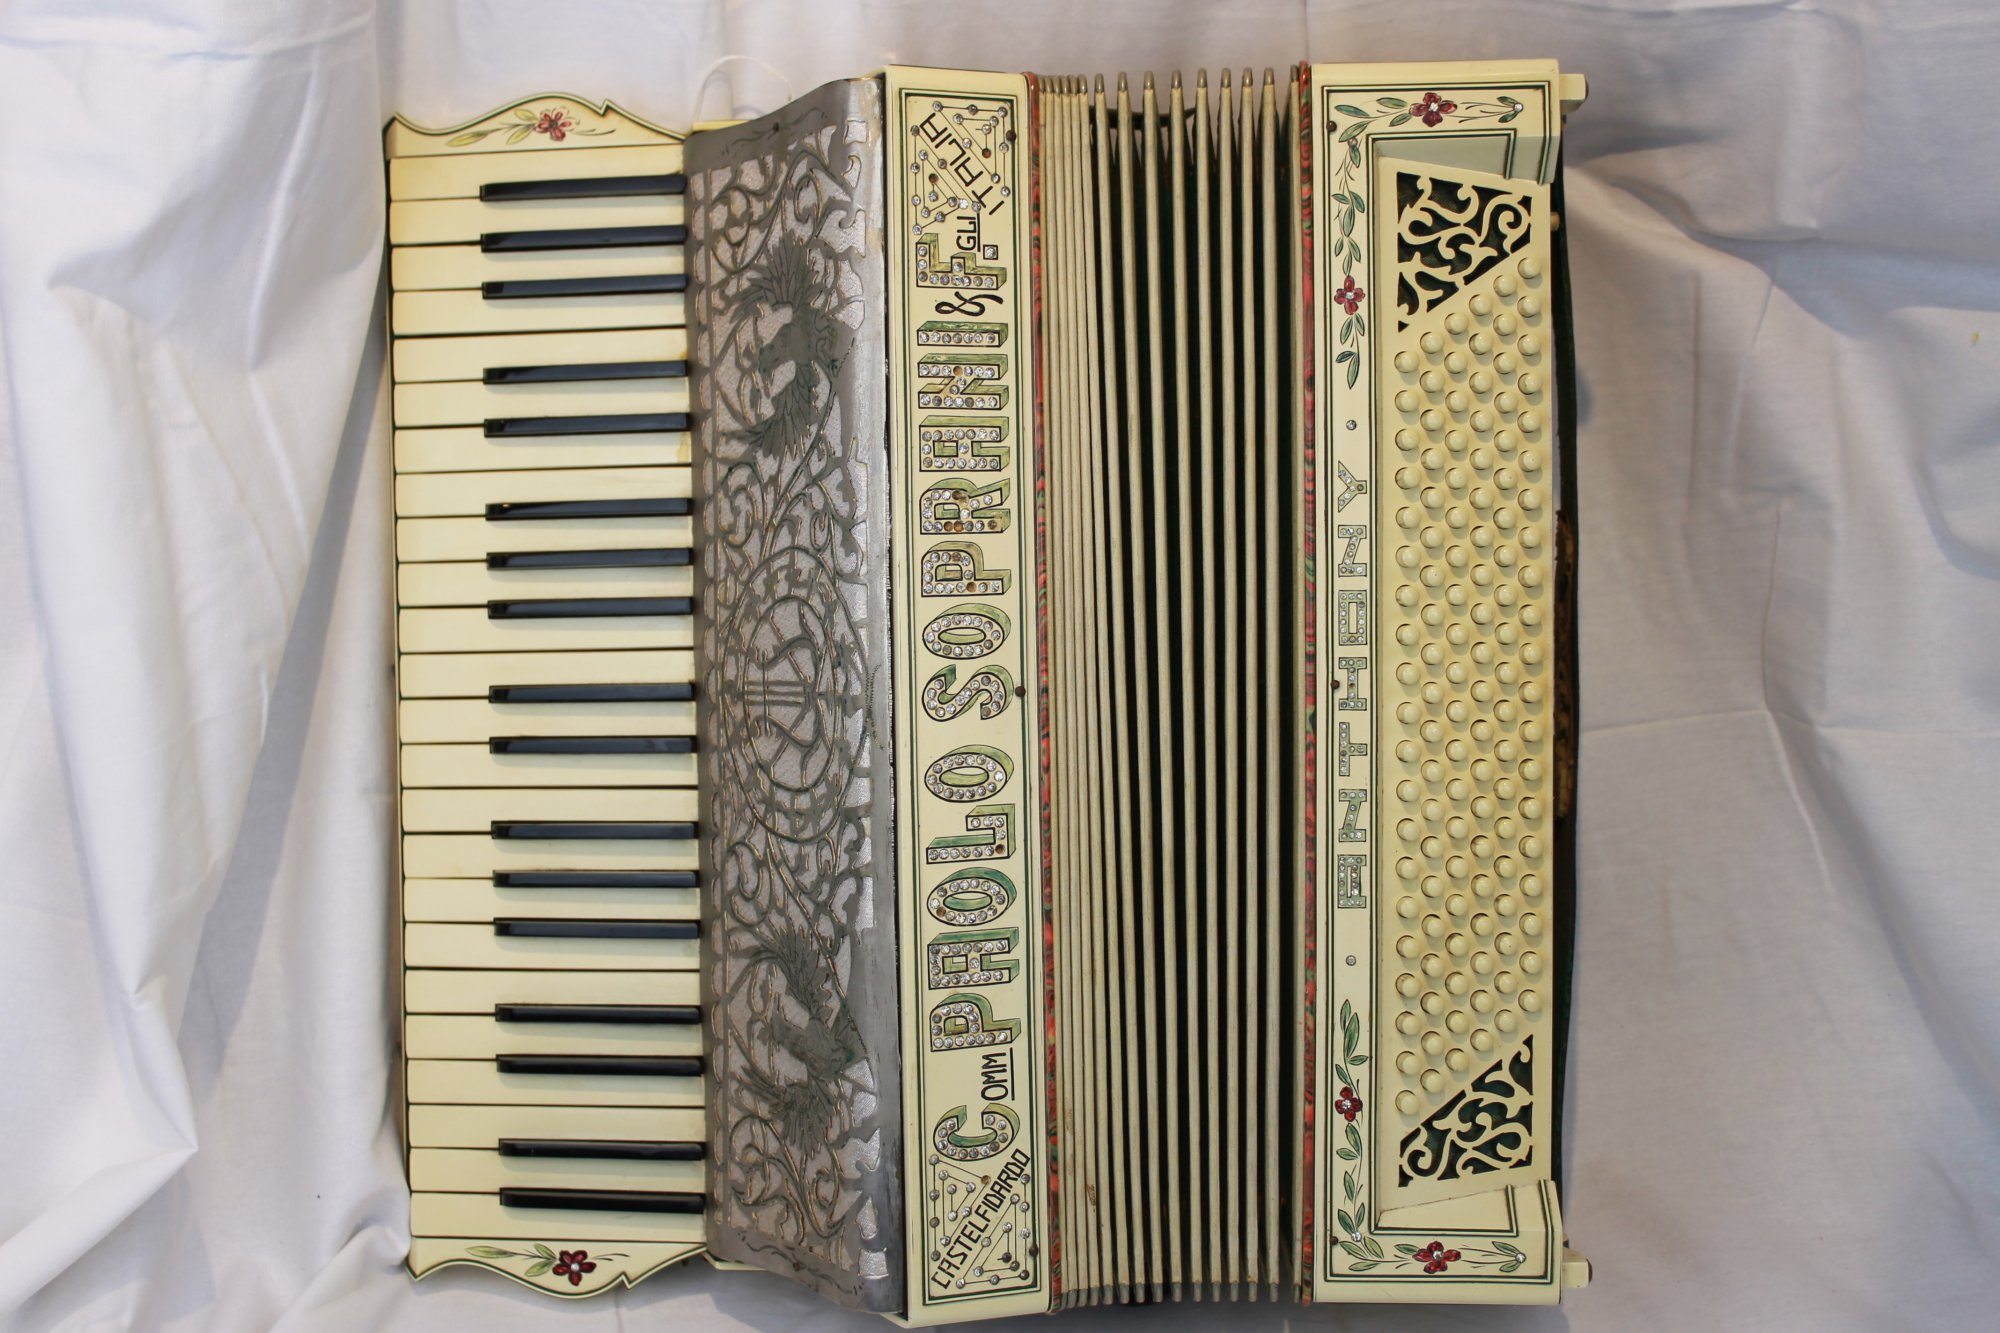 2910 - Ivory Paolo Soprani & Figli  Piano Accordion LMMM 41 120